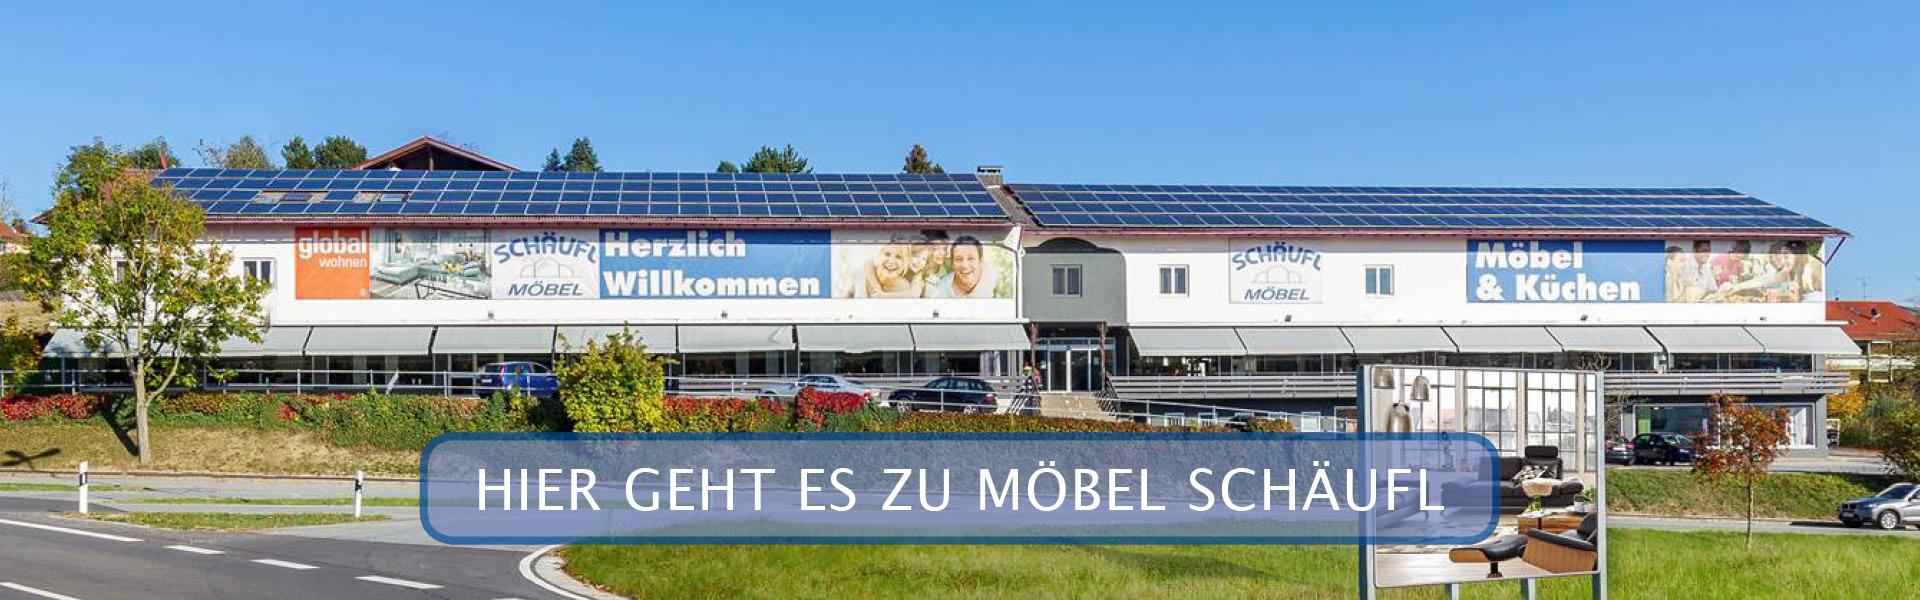 moebel-schaeufl-ek-bad-griesbach banner